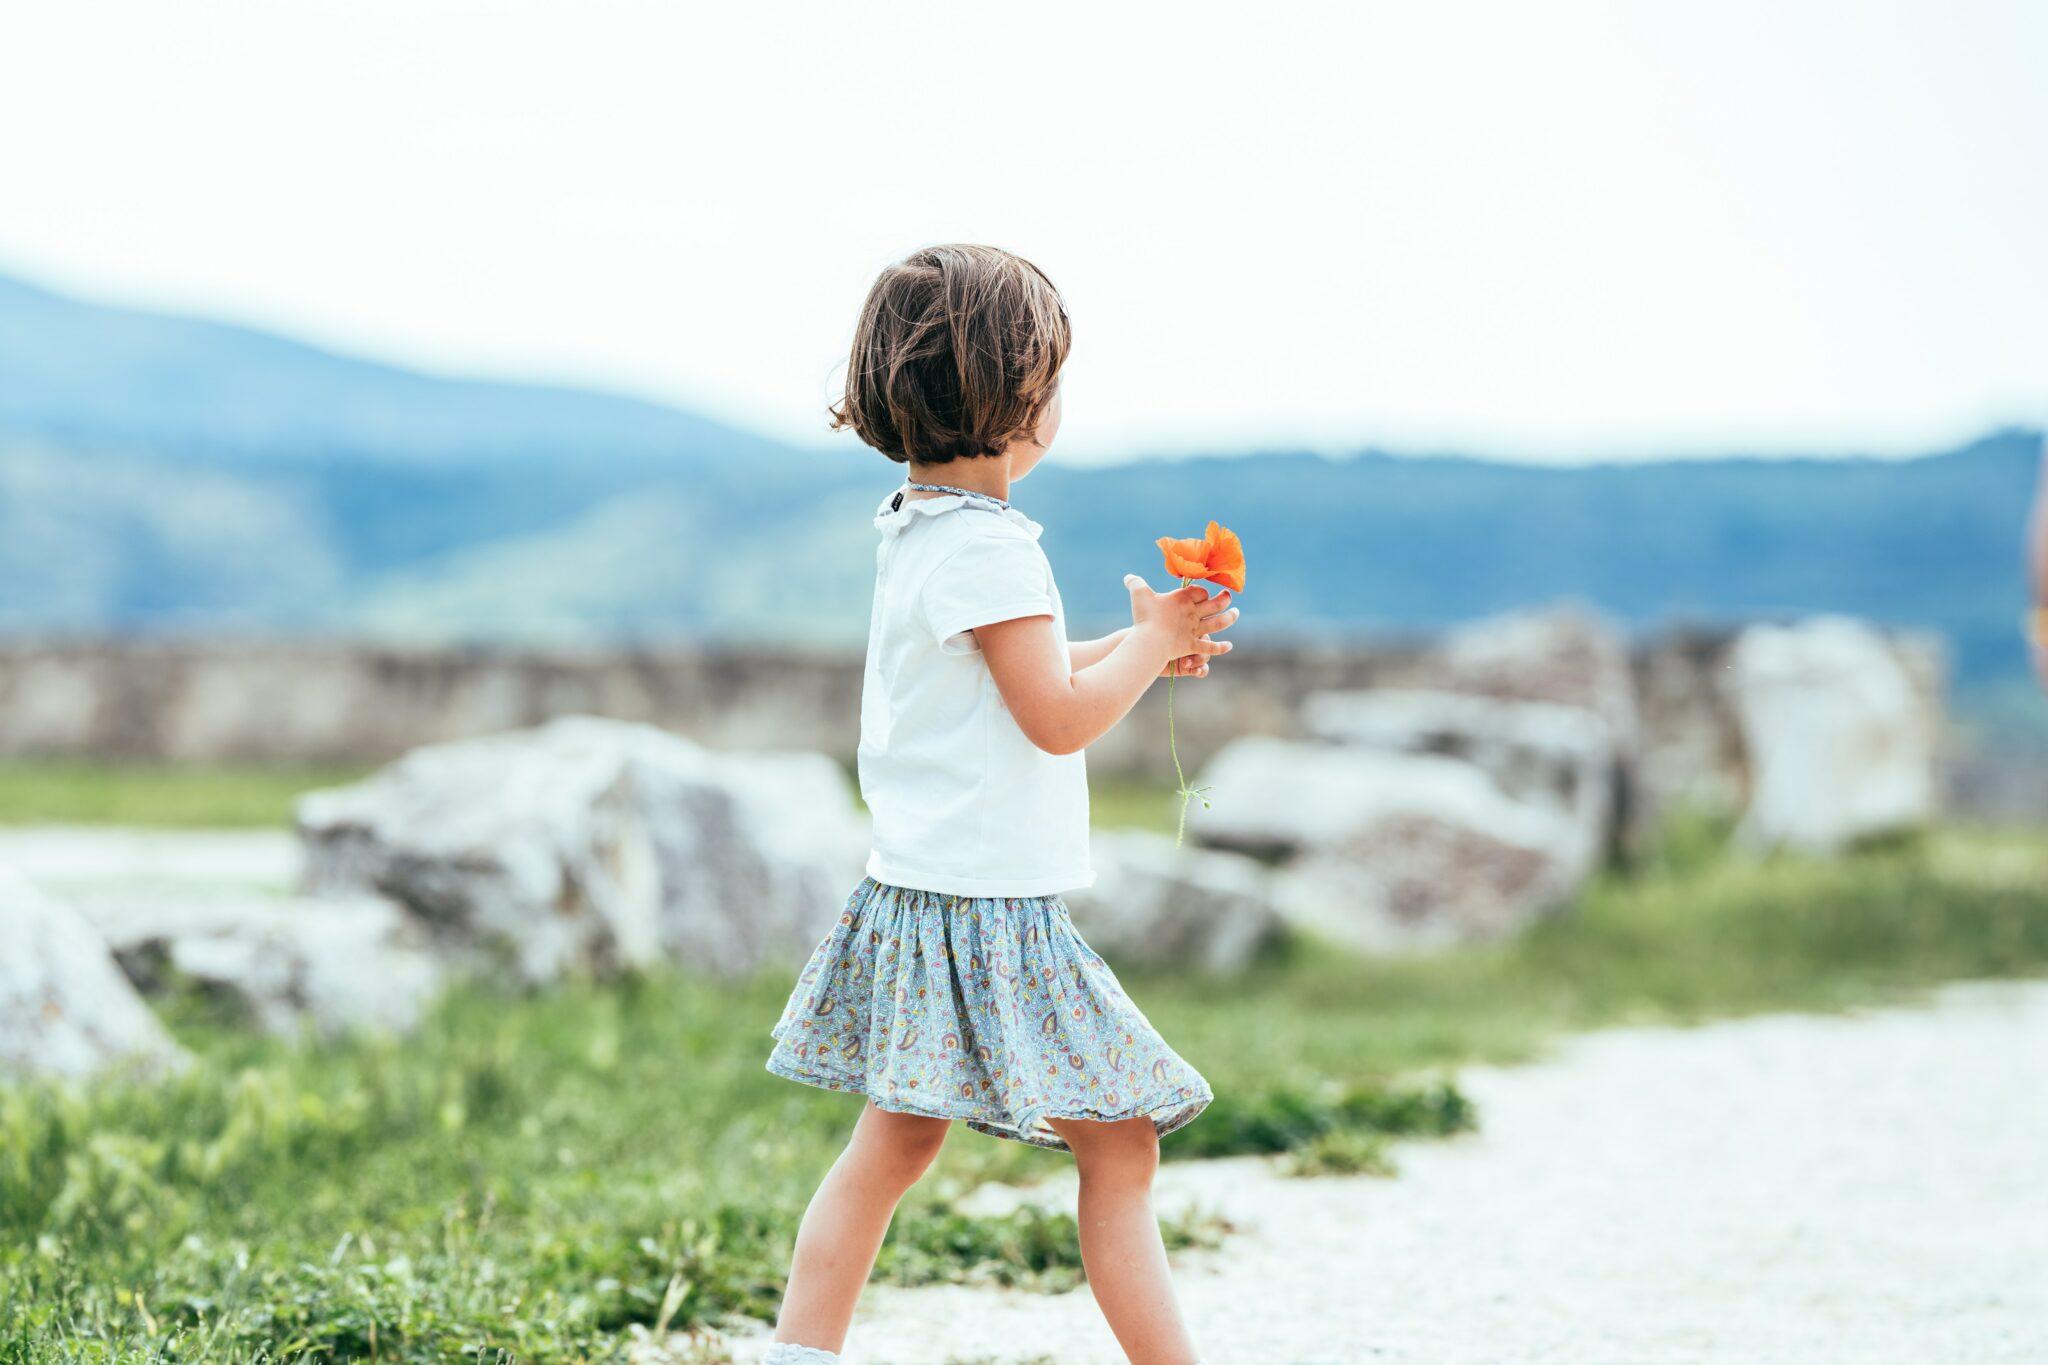 Het kleine meisje hoop